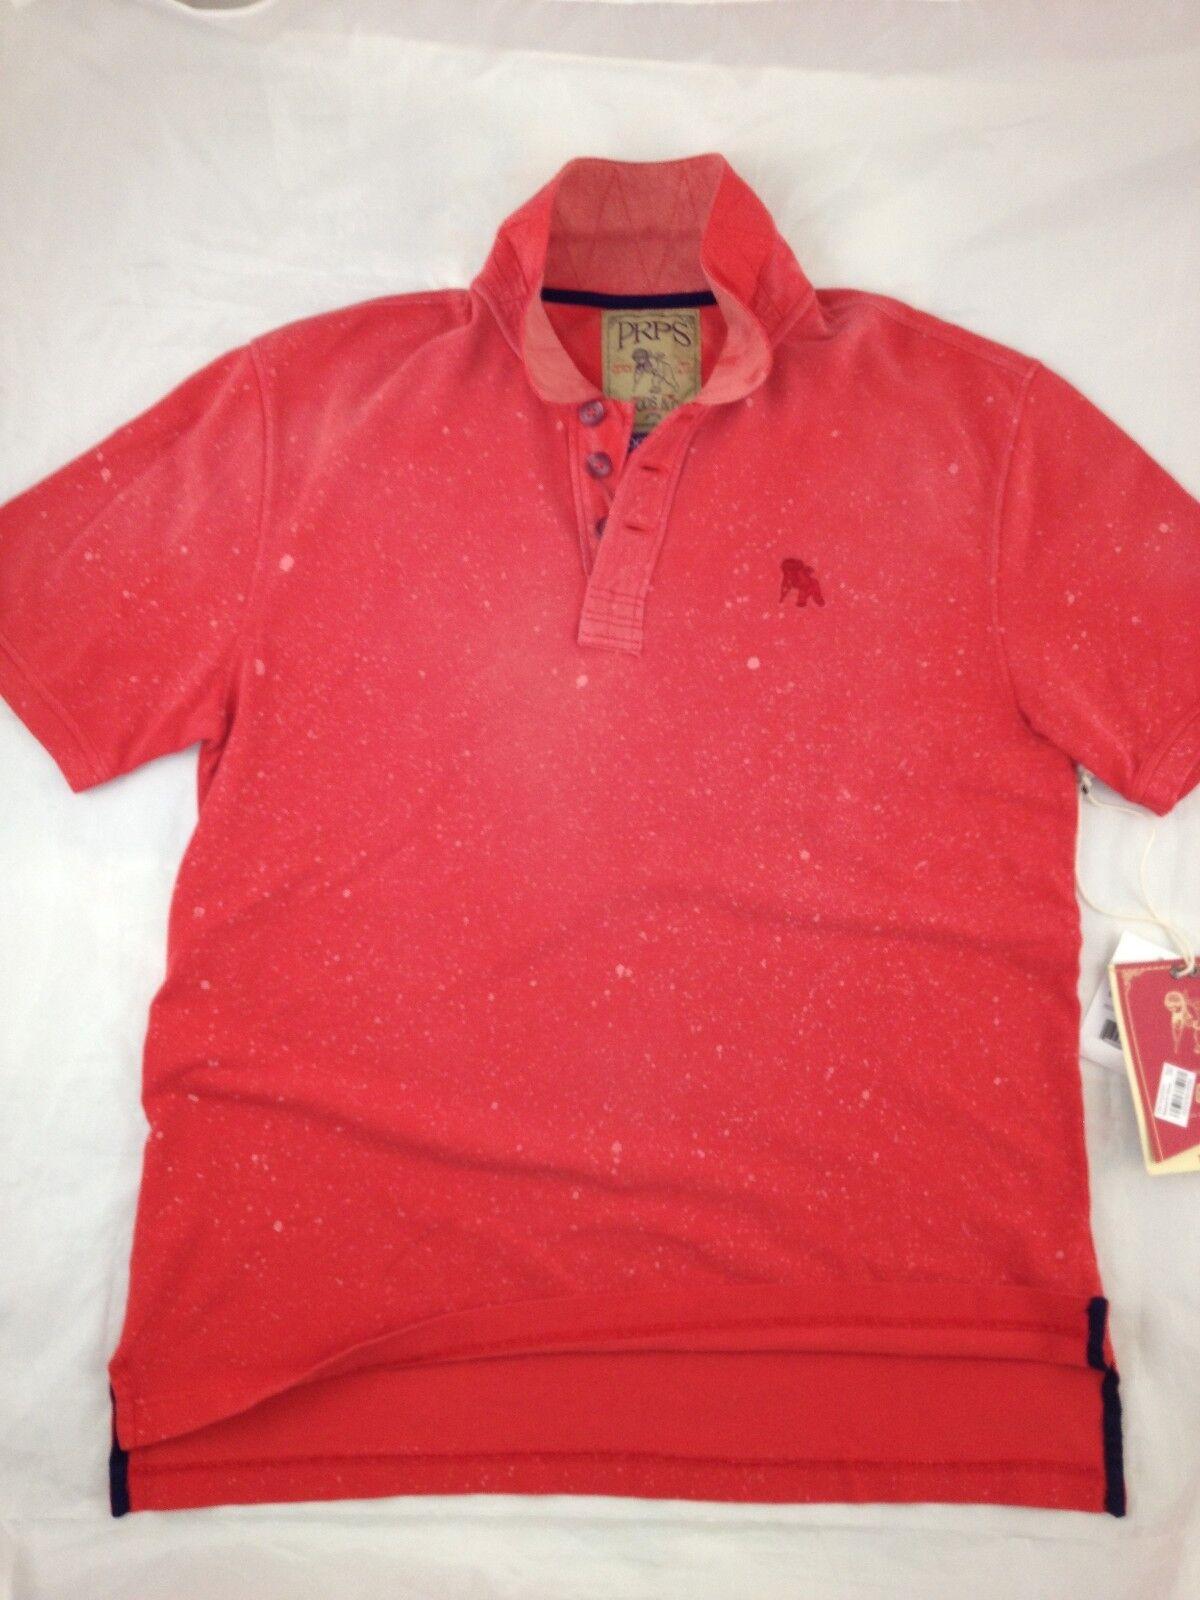 PRPS GOODS & CO. The Red Jersey Pique  ( Medium)   125